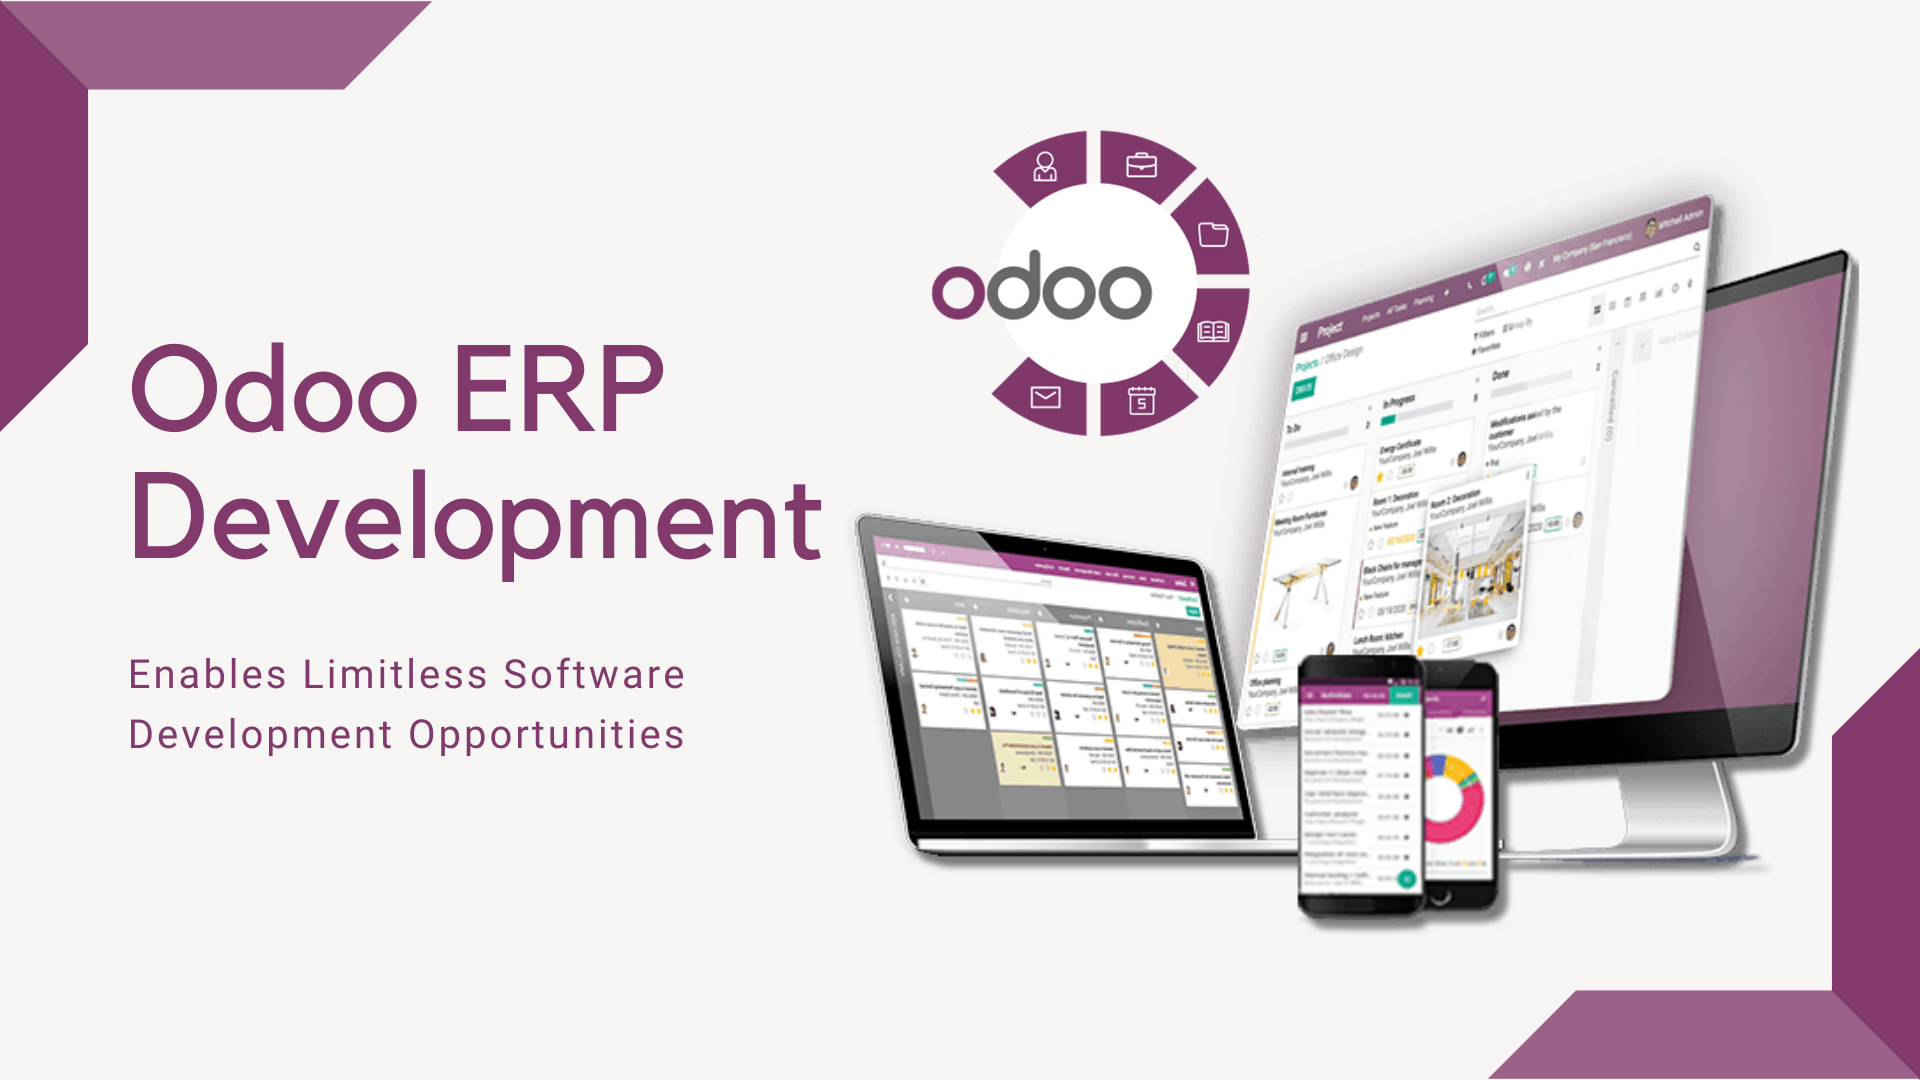 Odoo ERP Development